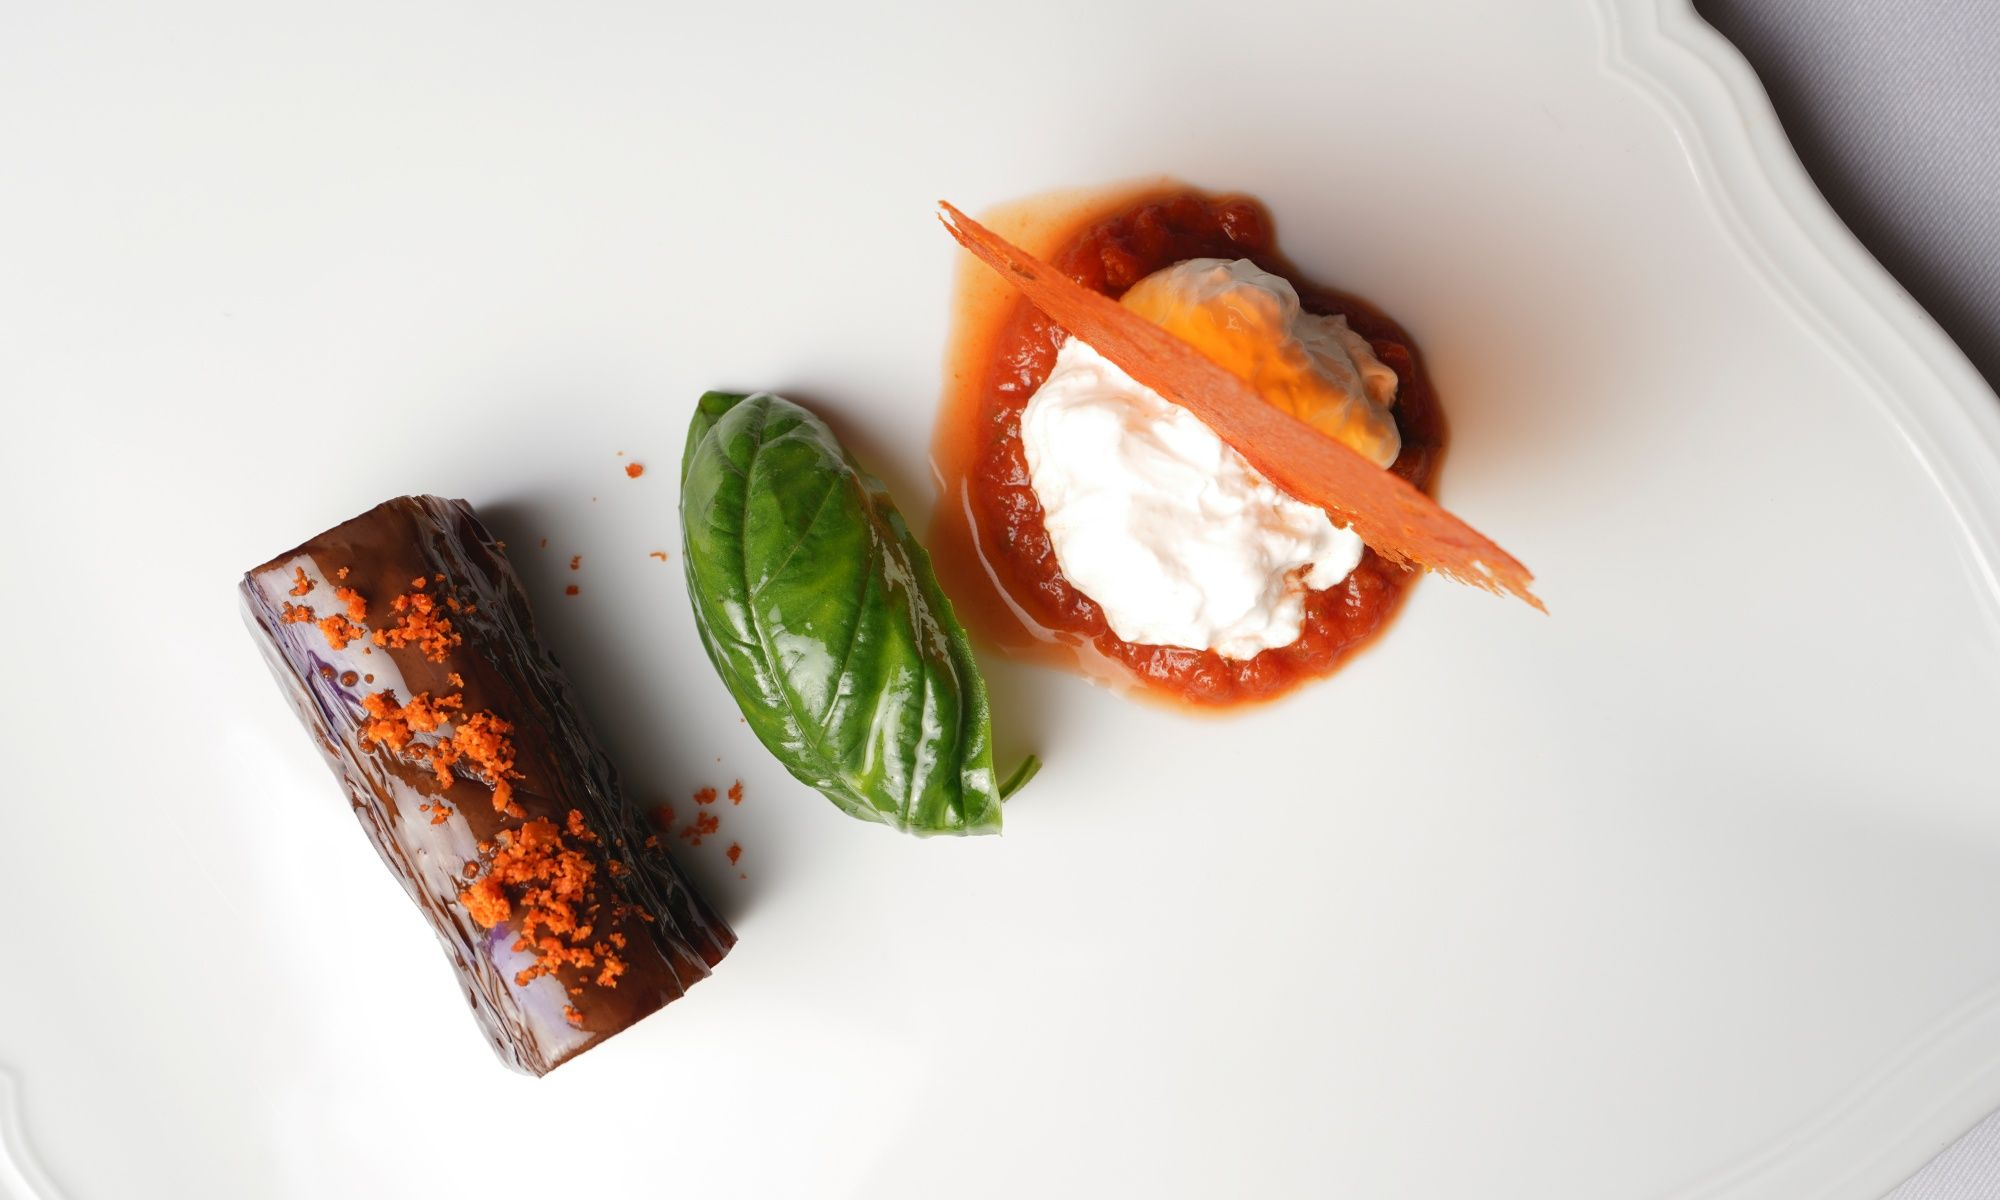 Castellana Launches New Seasonal Vegetarian Menu